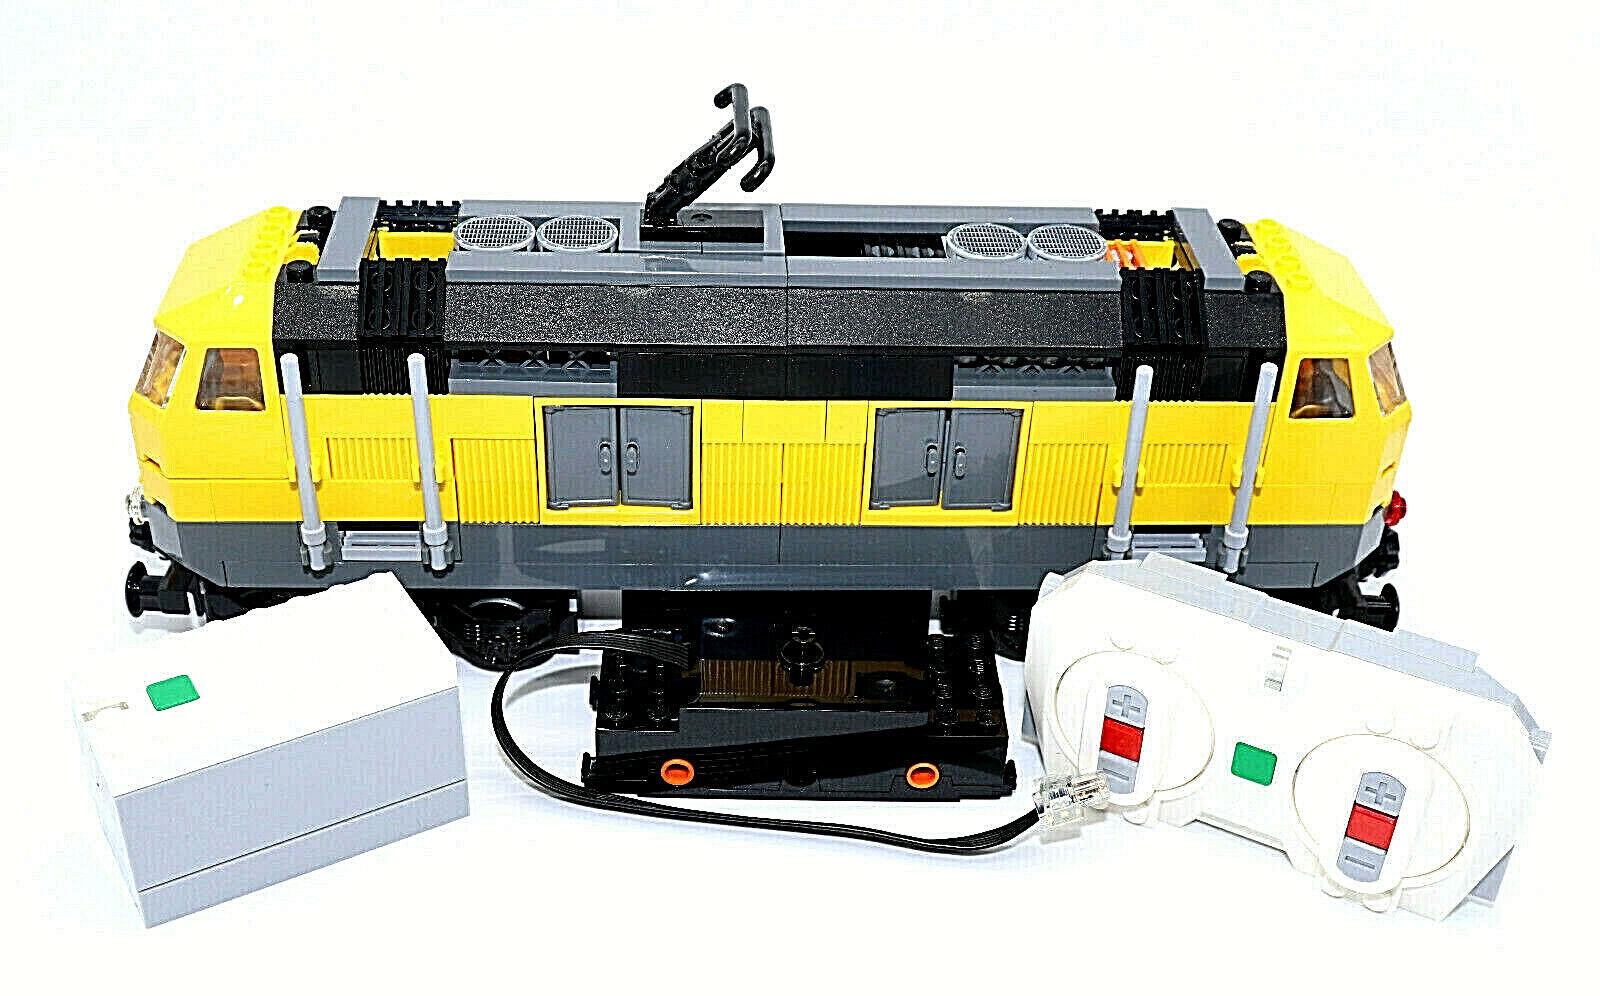 Lego Tren blueetooth yellows Locomotora Tren de Carga 7939,7938, 60051,60052,